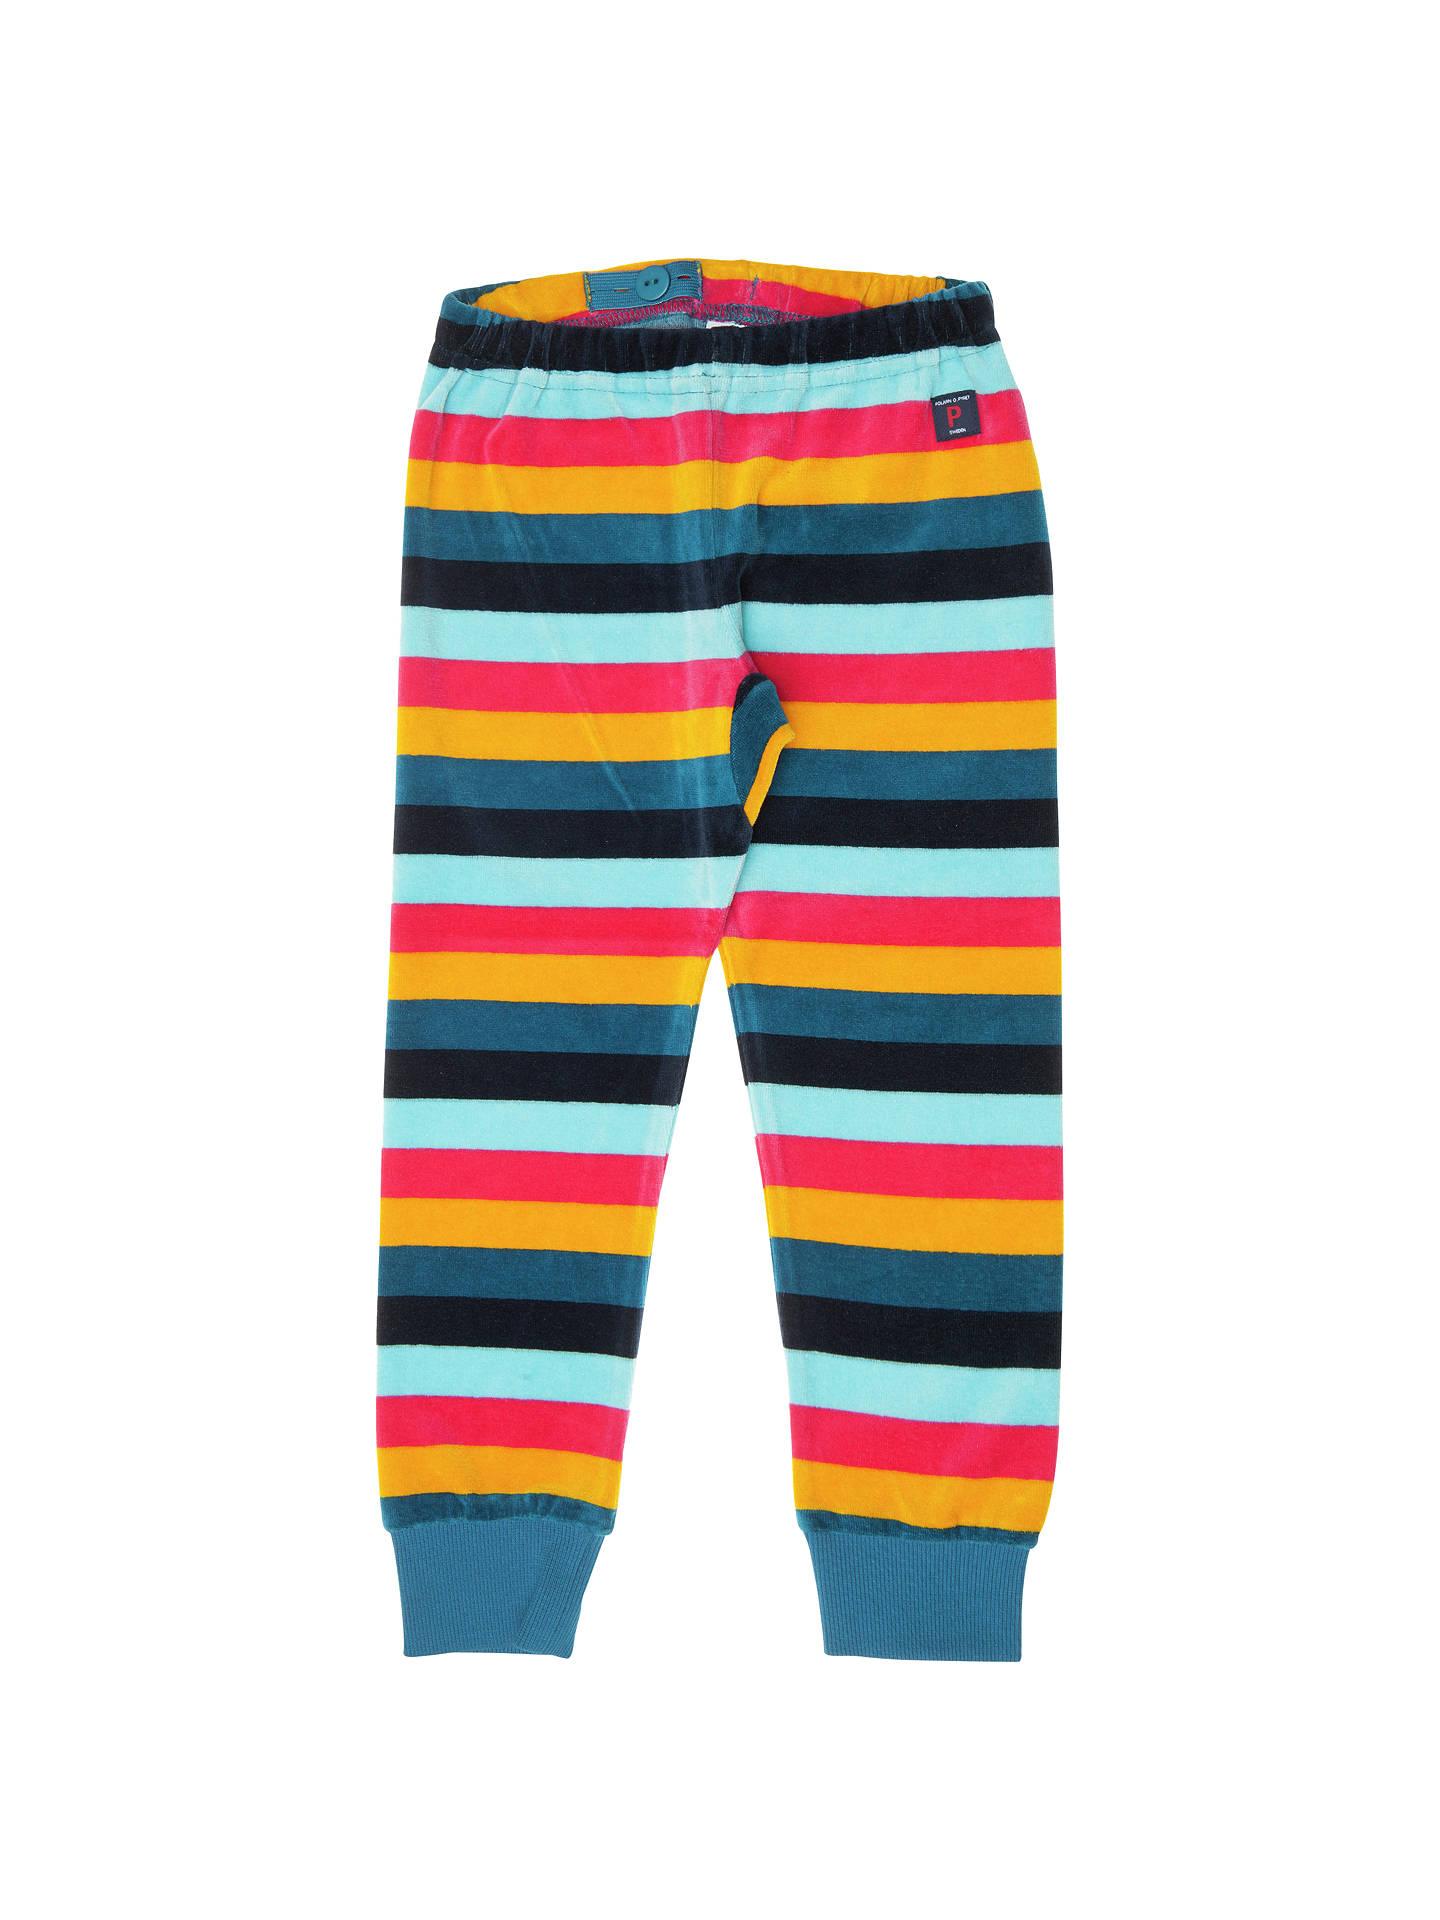 Baby Polarn O Pyret Stripey Panel Swim Trunks